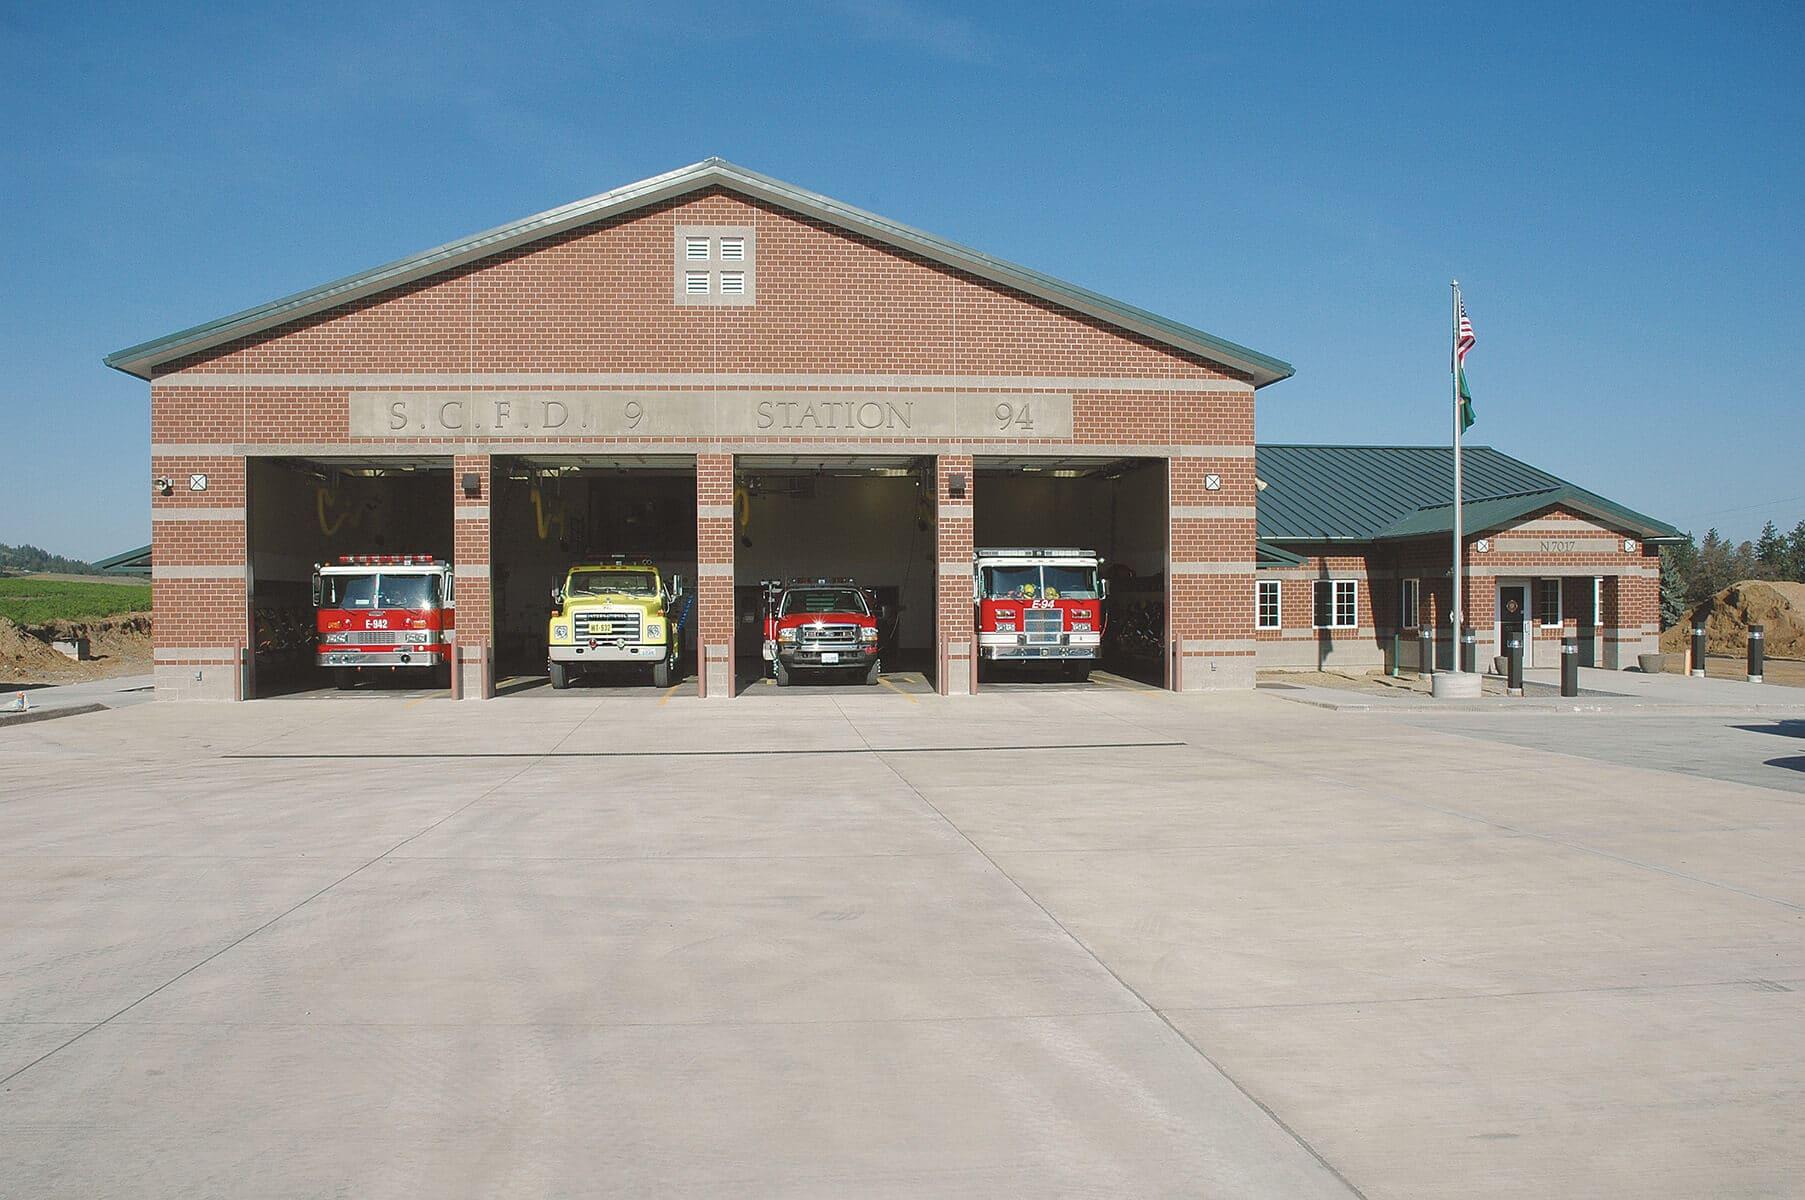 Spokane County Fire Station 94